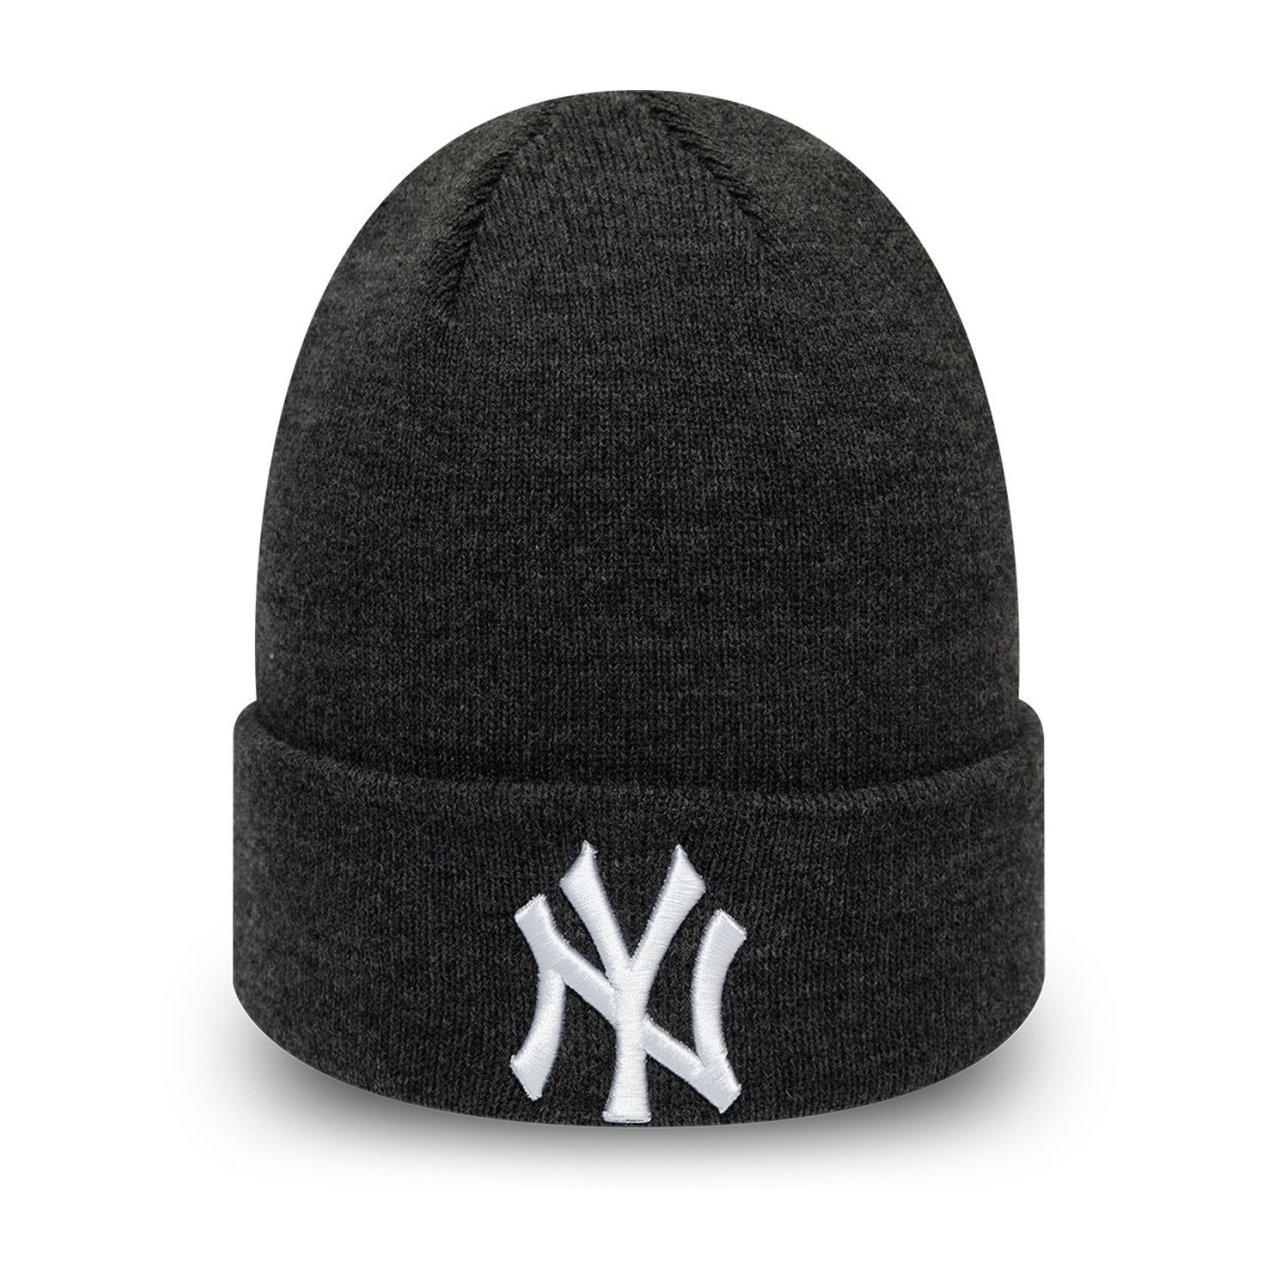 NY Yankees New Era Strick Beanie Kinder Winterm/ütze